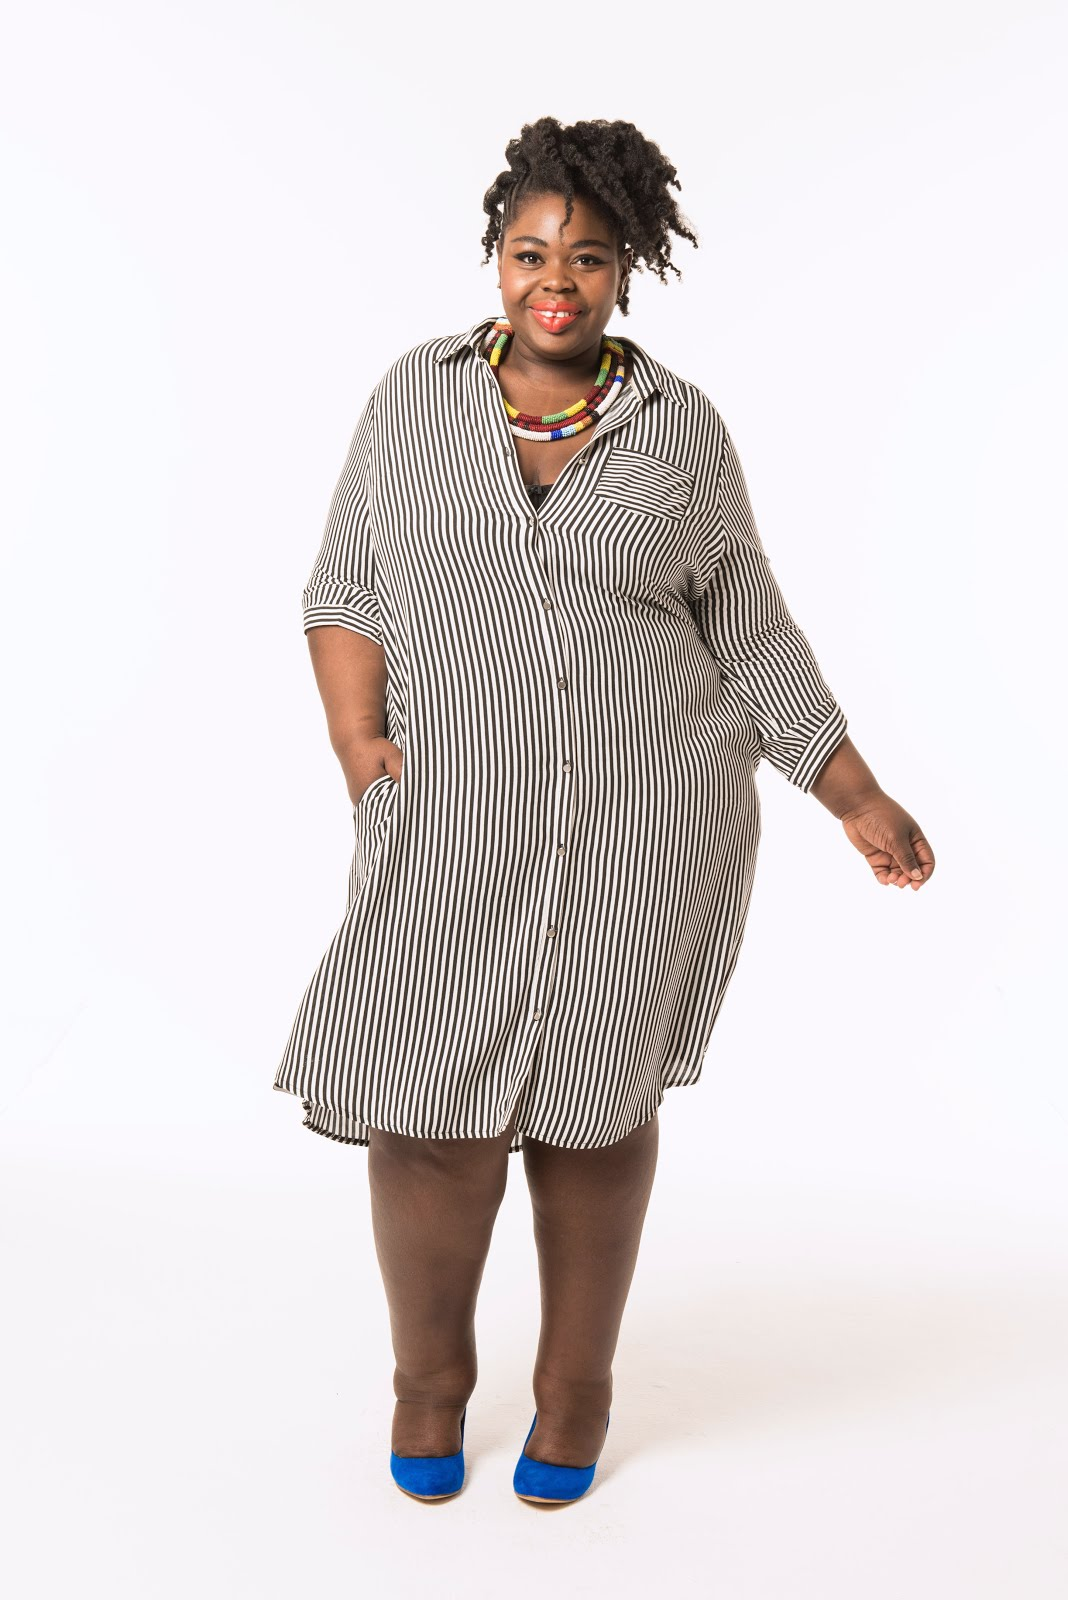 Découvres la robe-chemisier #GaellePrudencioXBalsamik